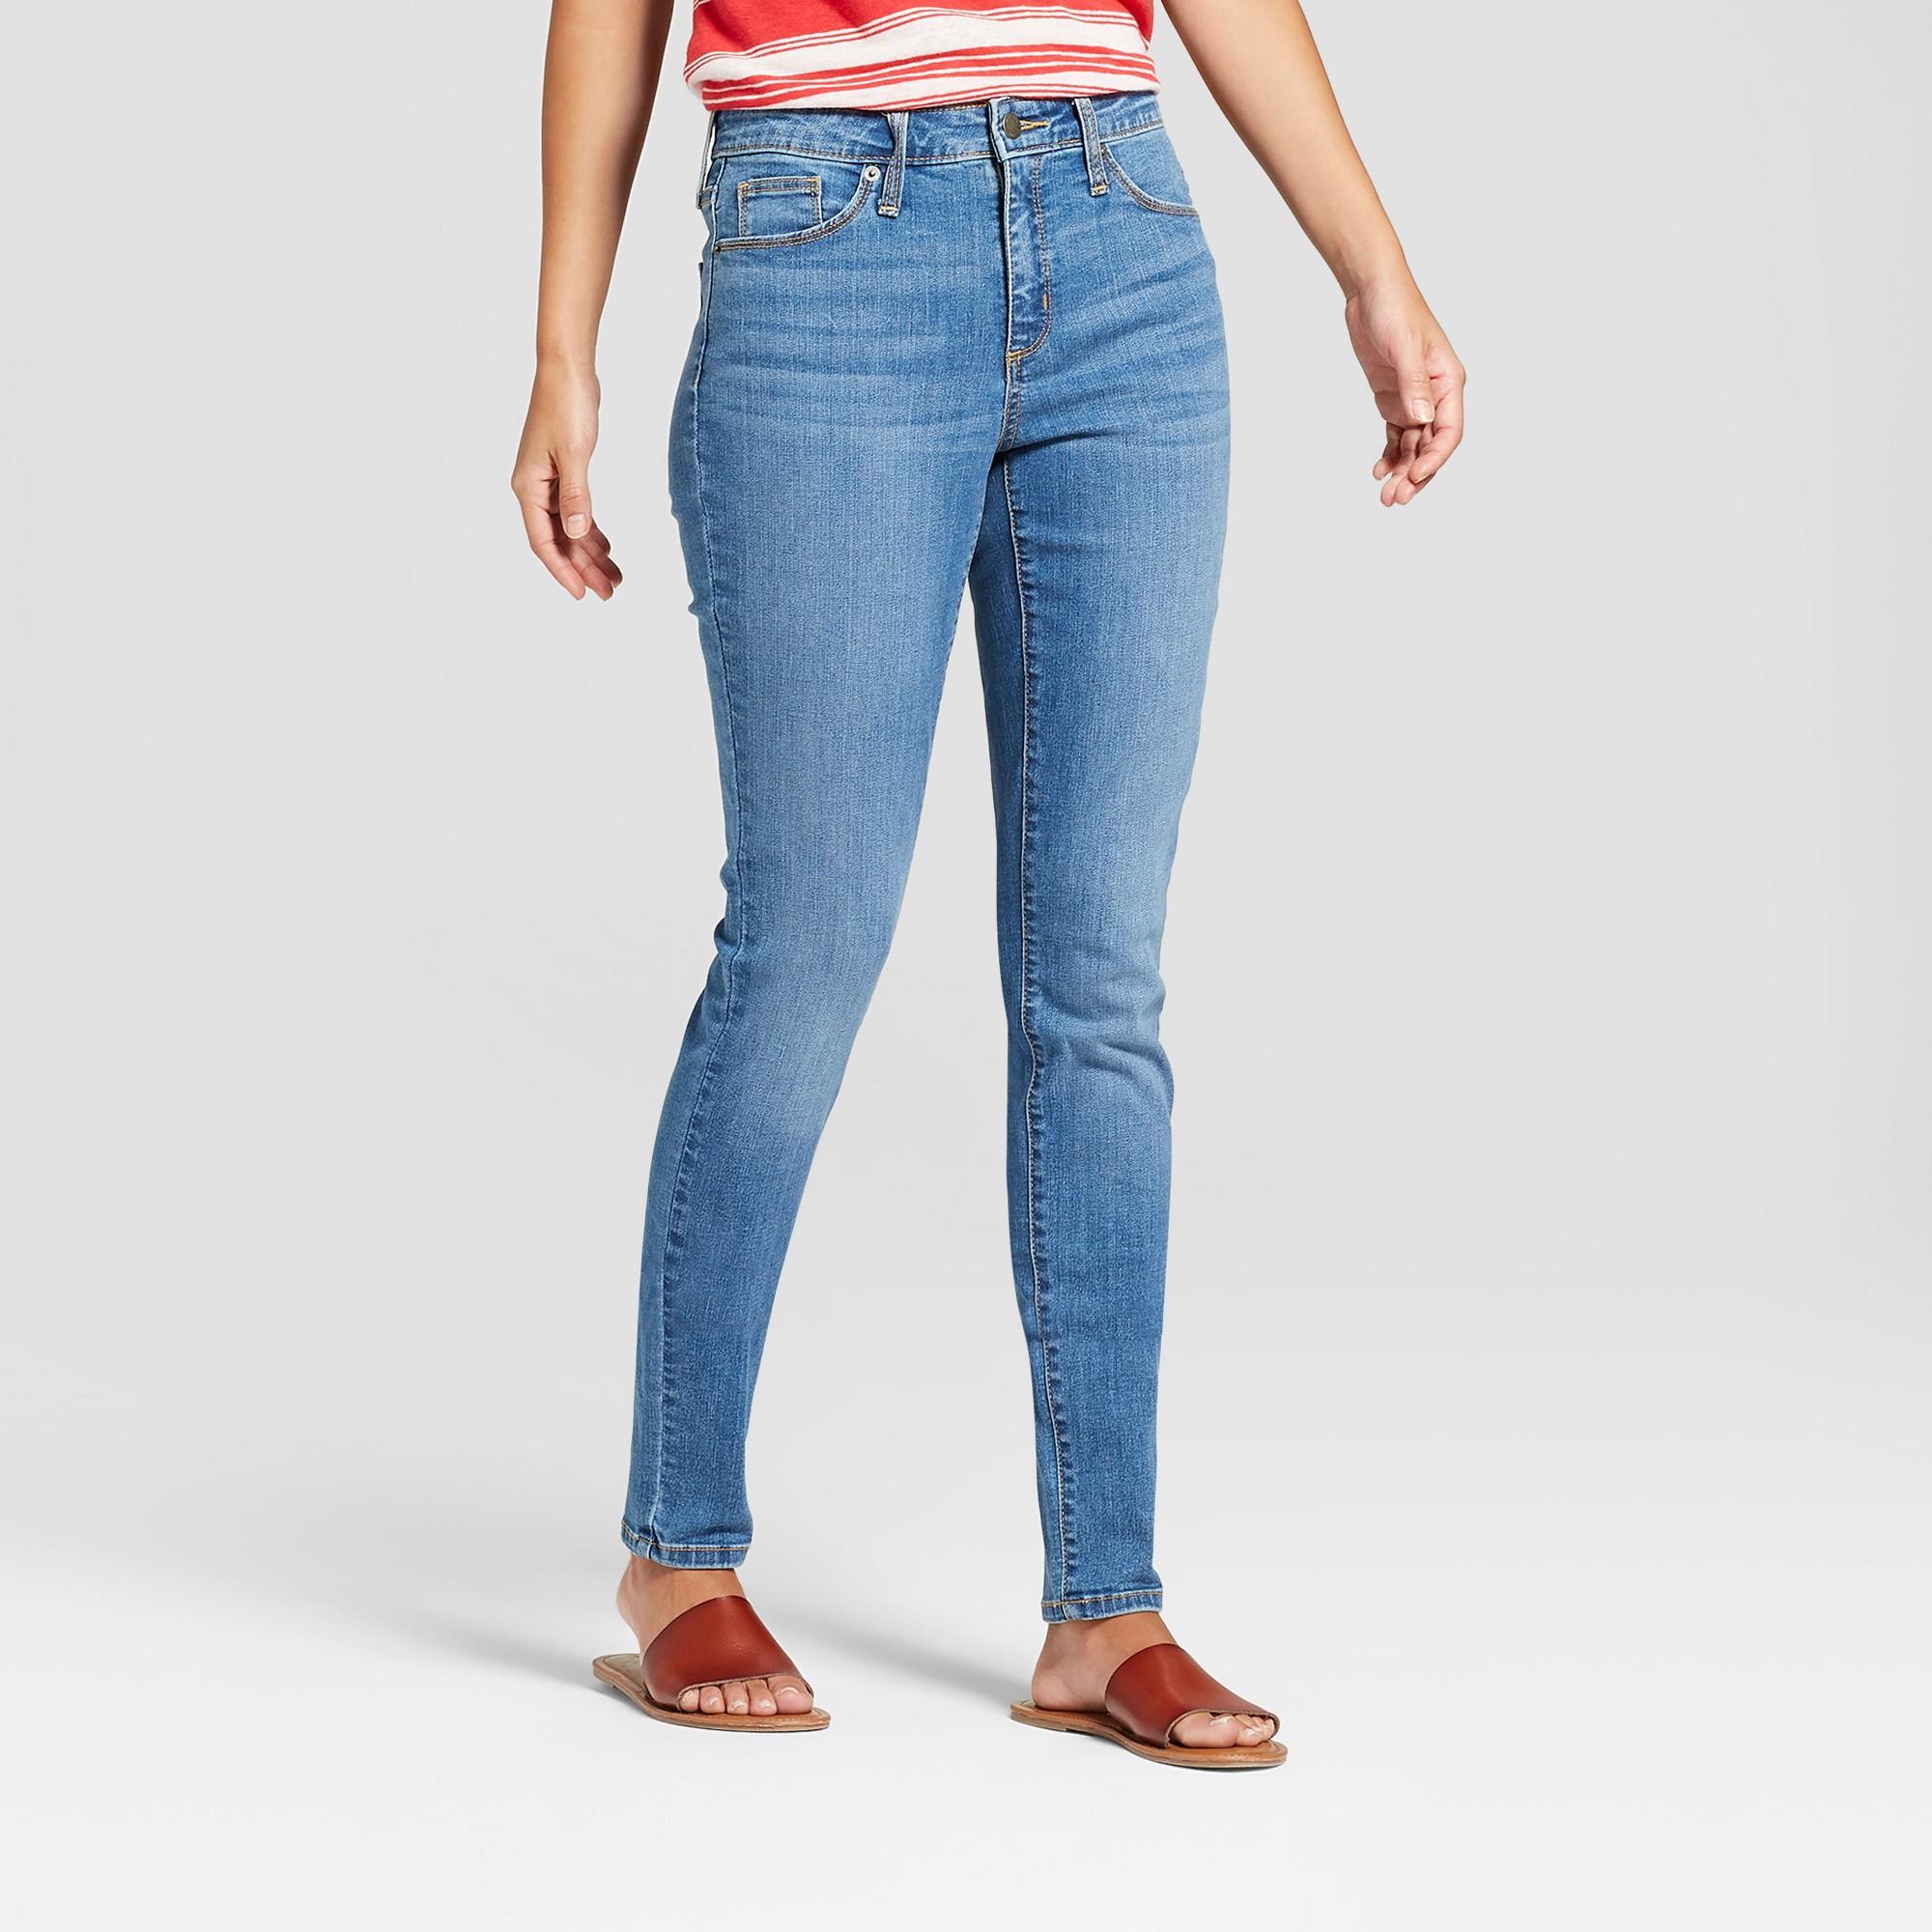 Women's High-Rise Skinny Jeans - Universal Thread Medium Wash 4 Long, Blue